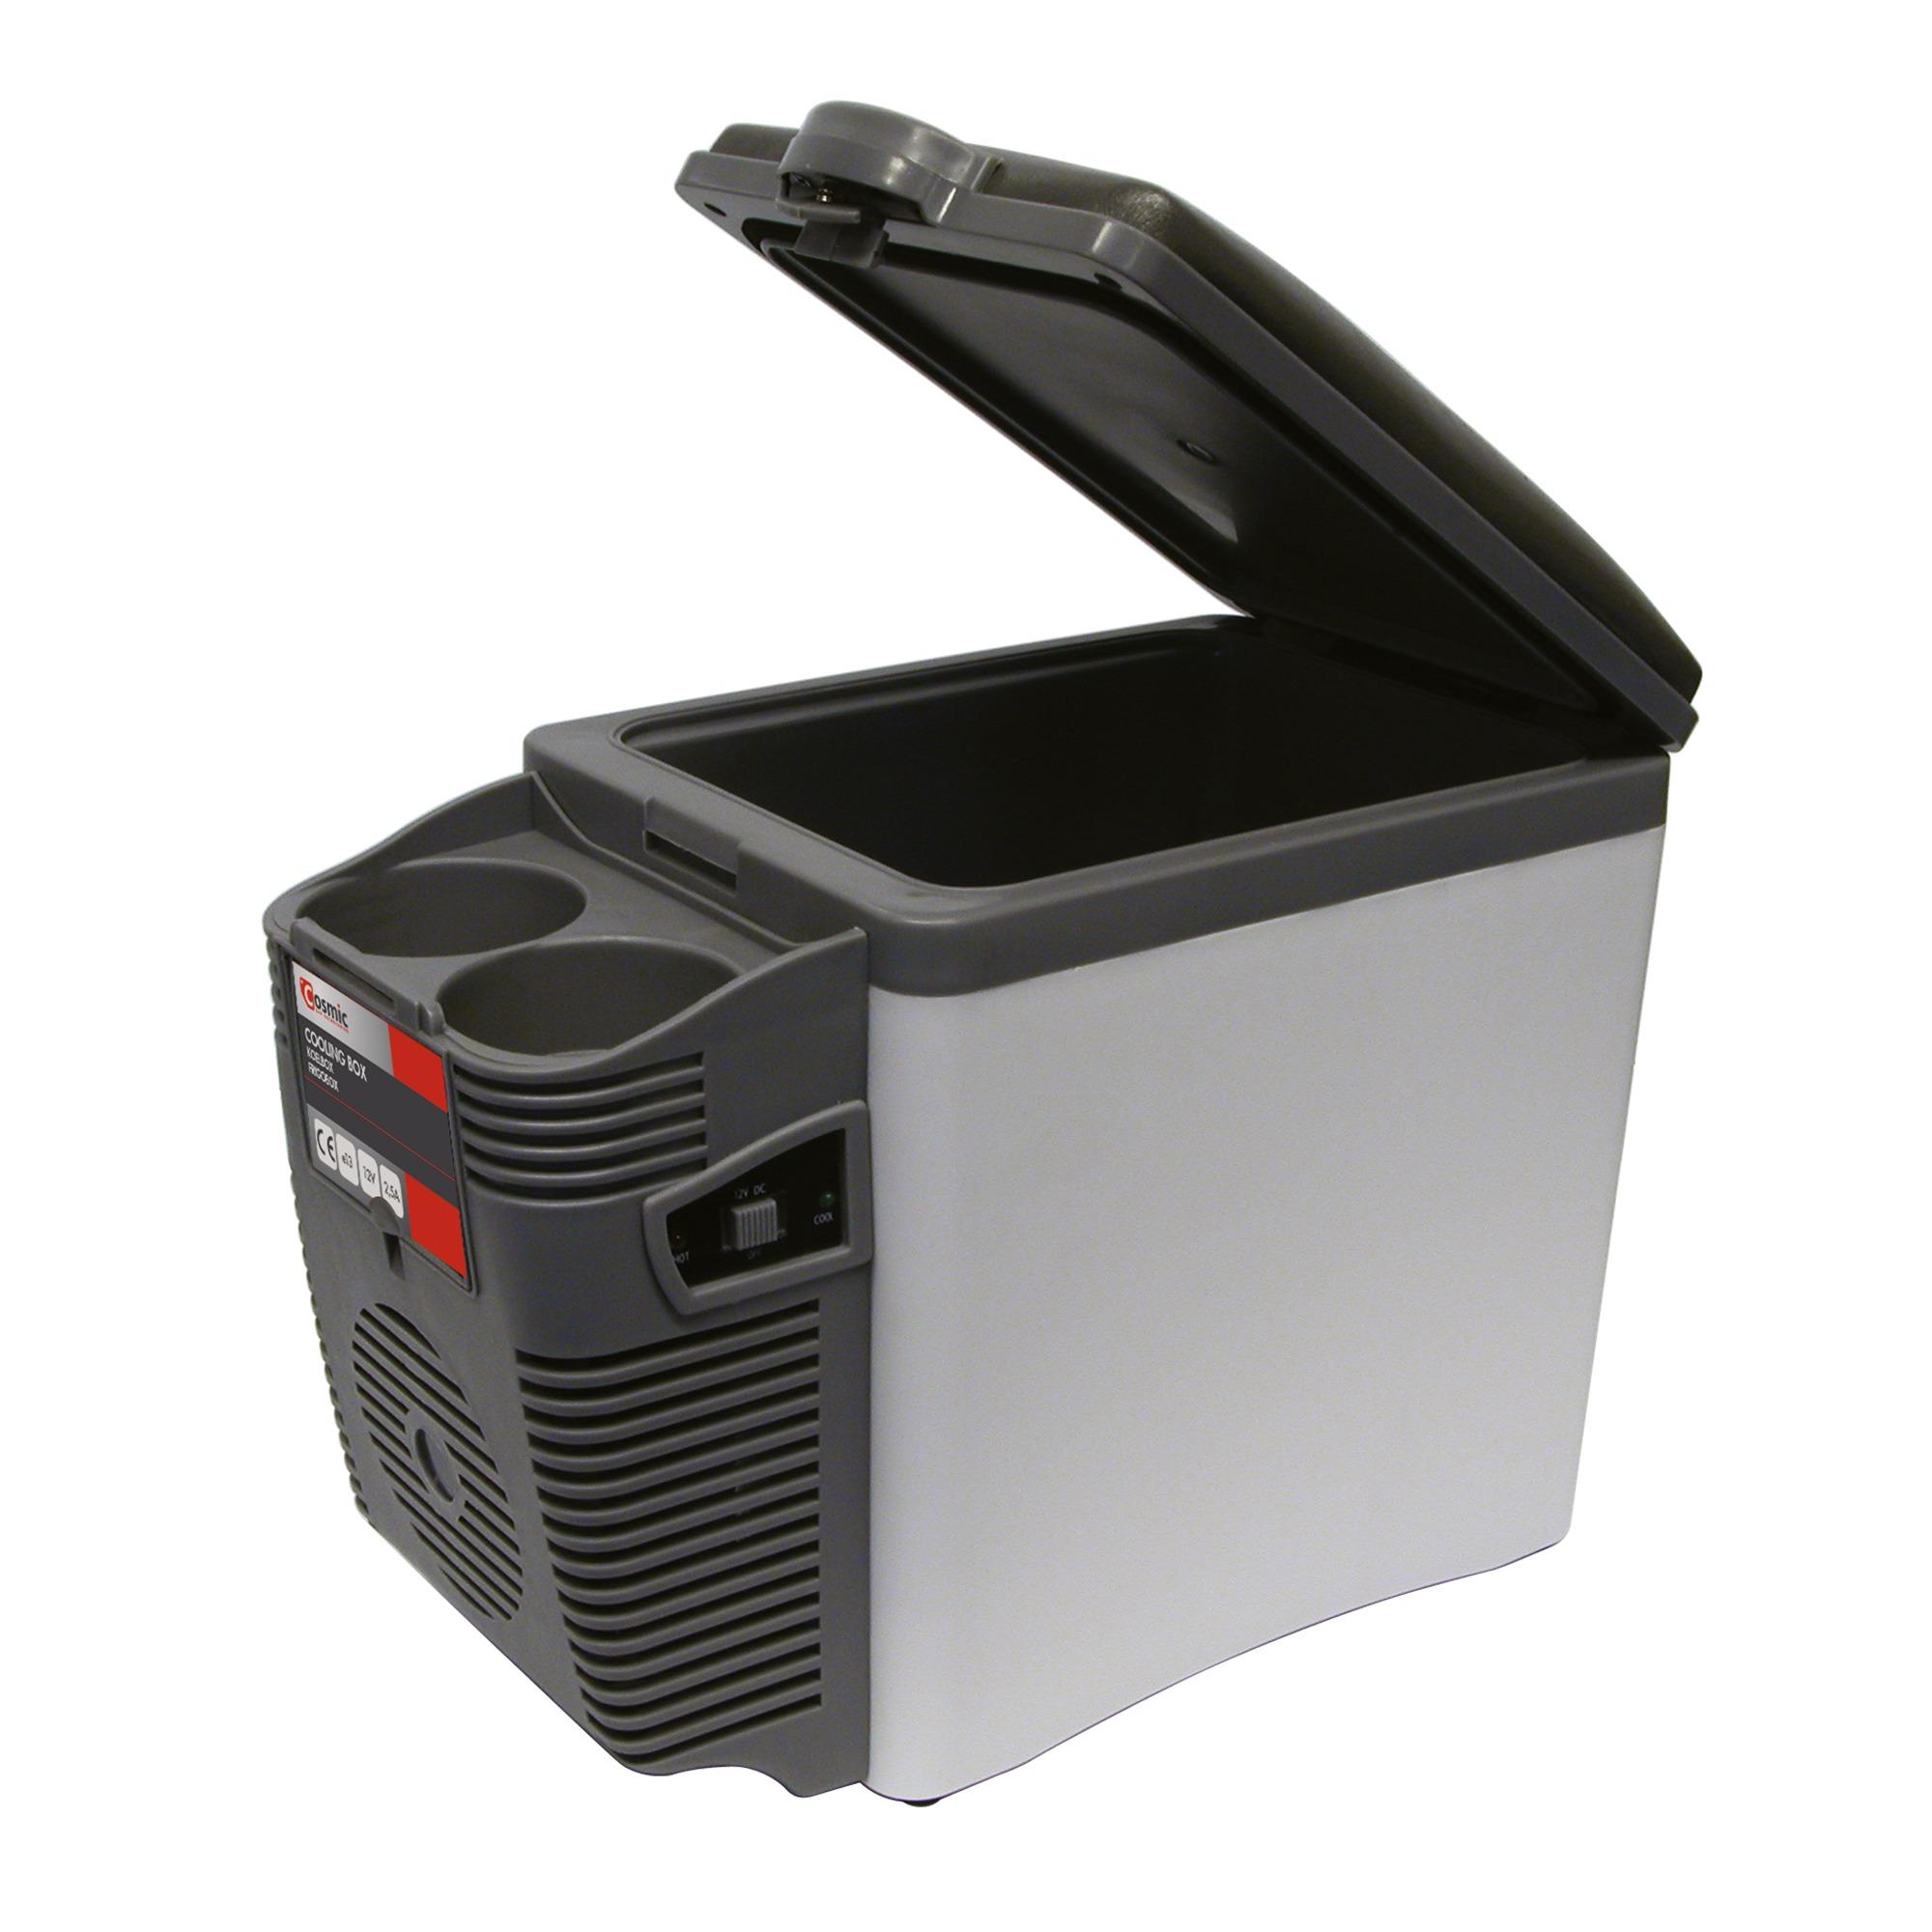 koelbox heet en koud 12 v 6 liter interieuraccessoires autoaccessoires auto fiets gamma. Black Bedroom Furniture Sets. Home Design Ideas